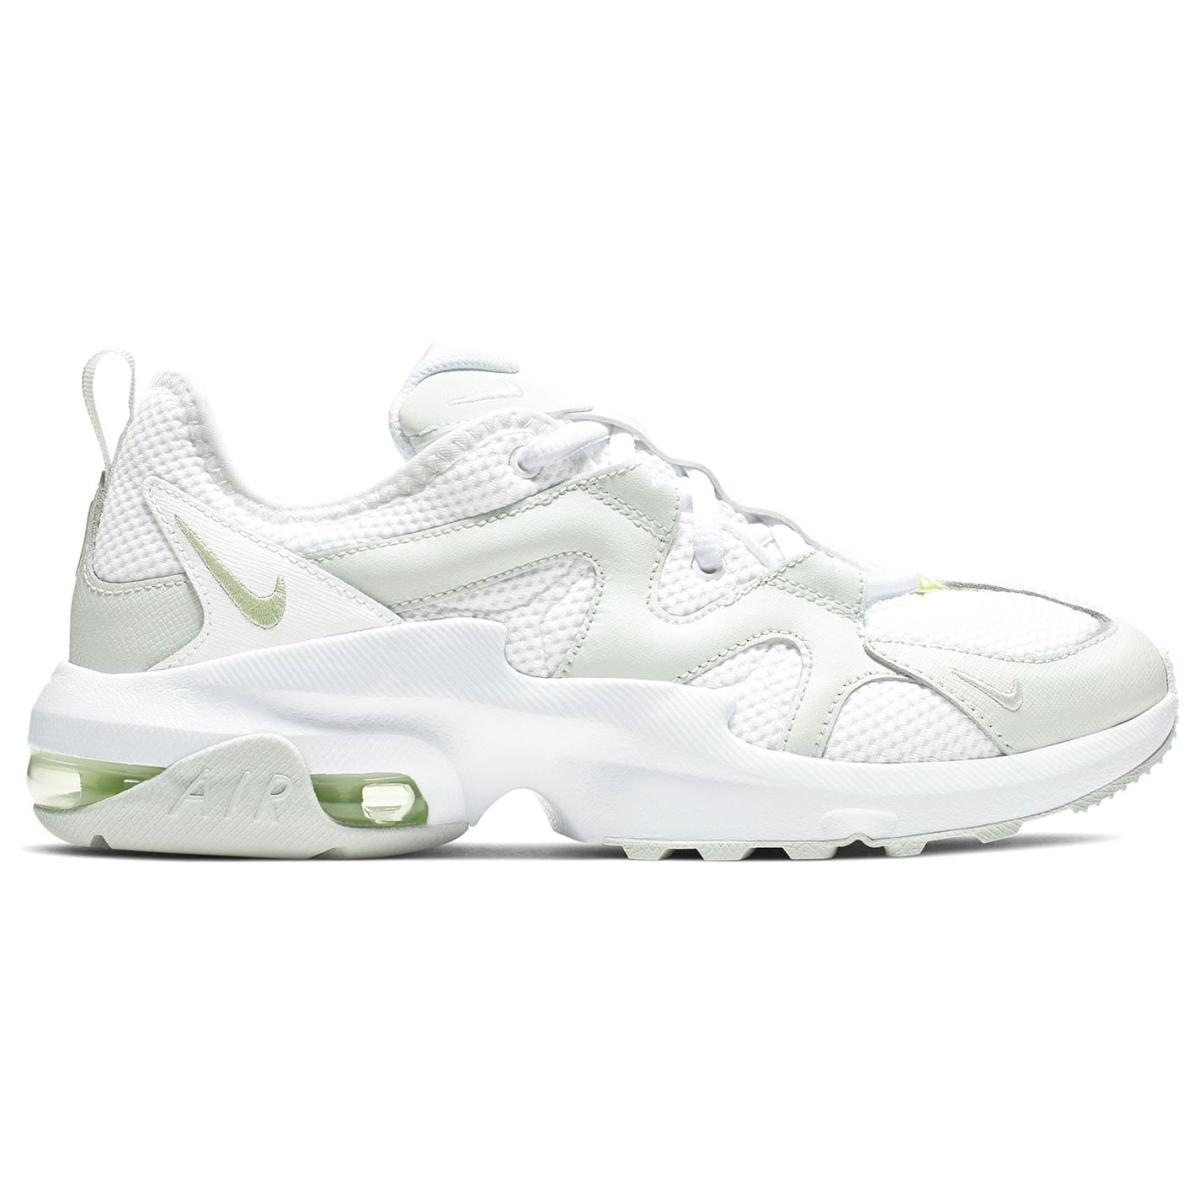 Nike-Air-Max-Graviton-Turnschuhe-Damen-Sneaker-Sportschuhe-Laufschuhe-4069 Indexbild 12